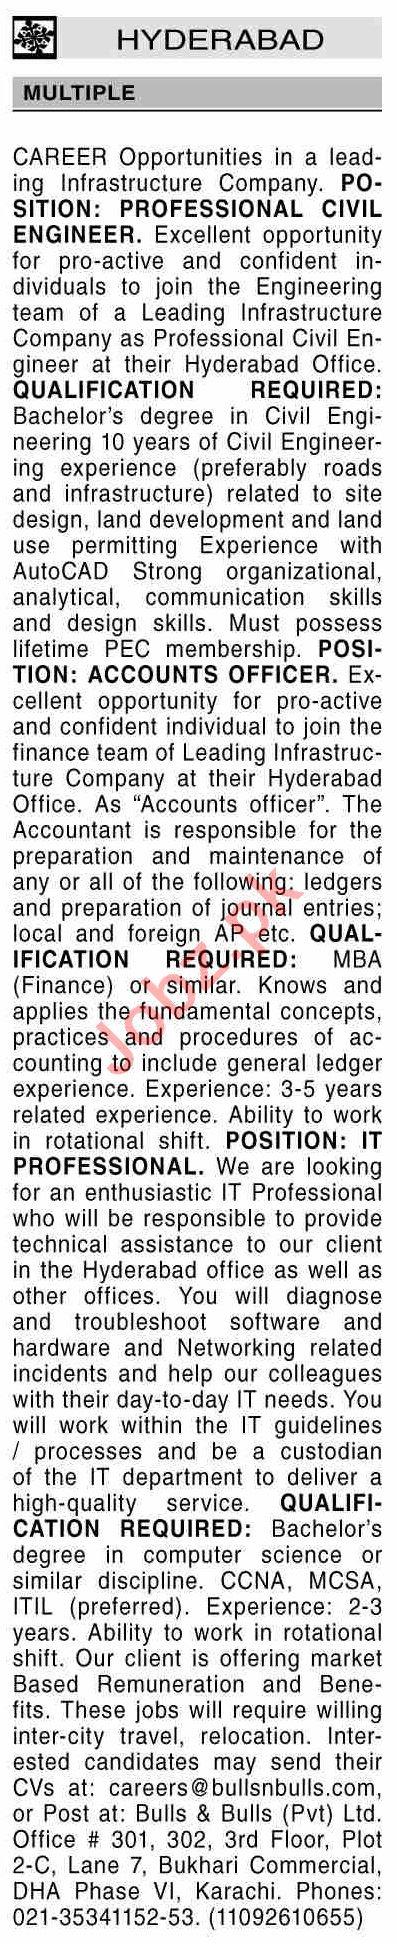 Dawn Sunday Hyderabad Classified Ads 20 June 2021